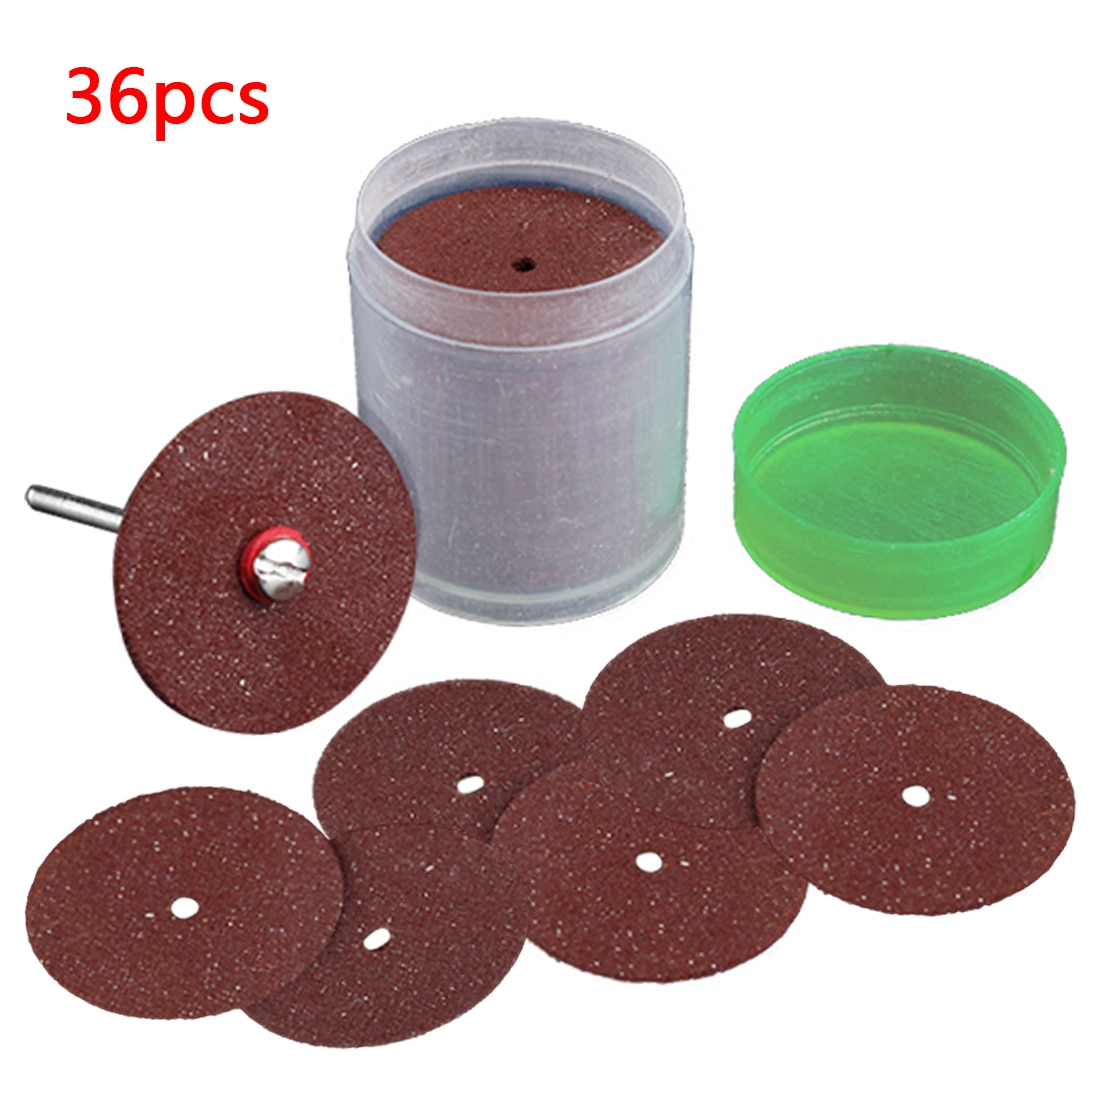 36 pçs disco de corte lâmina serra circular roda de moagem para dremel ferramenta rotativa abrasiva lixar disco ferramentas corte madeira metal